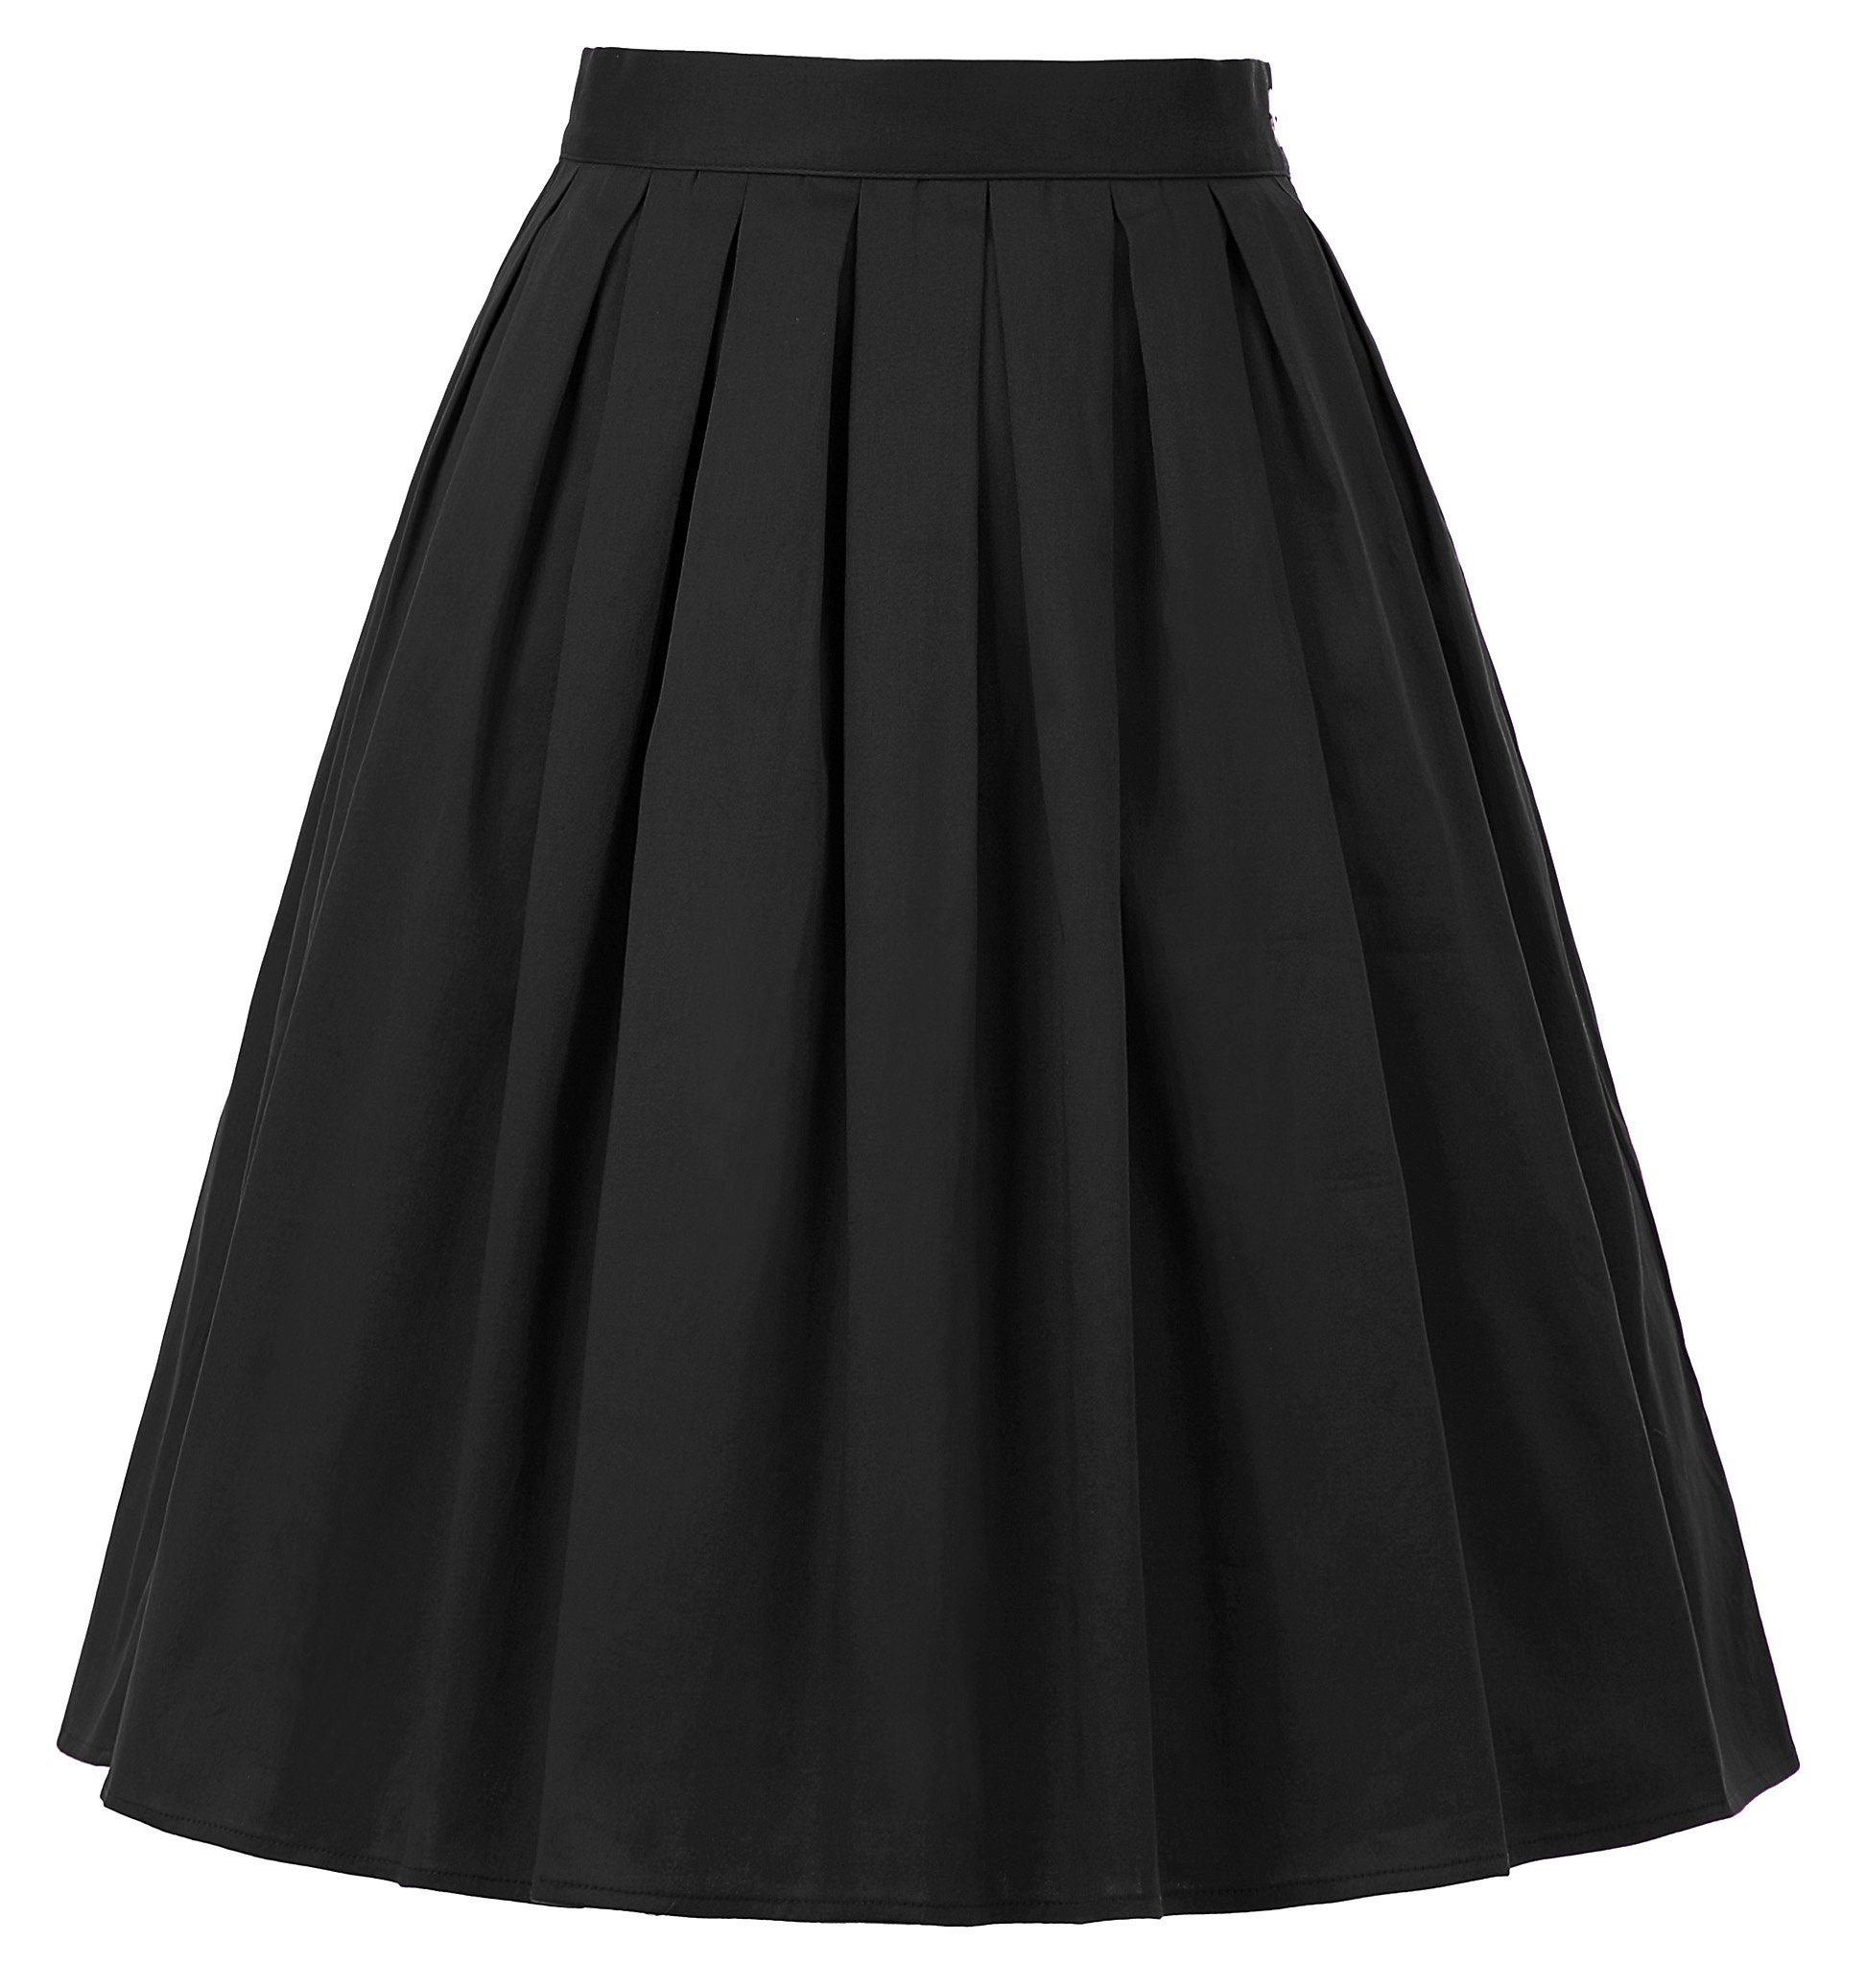 GRACE KARIN 50s Vintage Skirts for Women A Line Black Size S CL6294-28